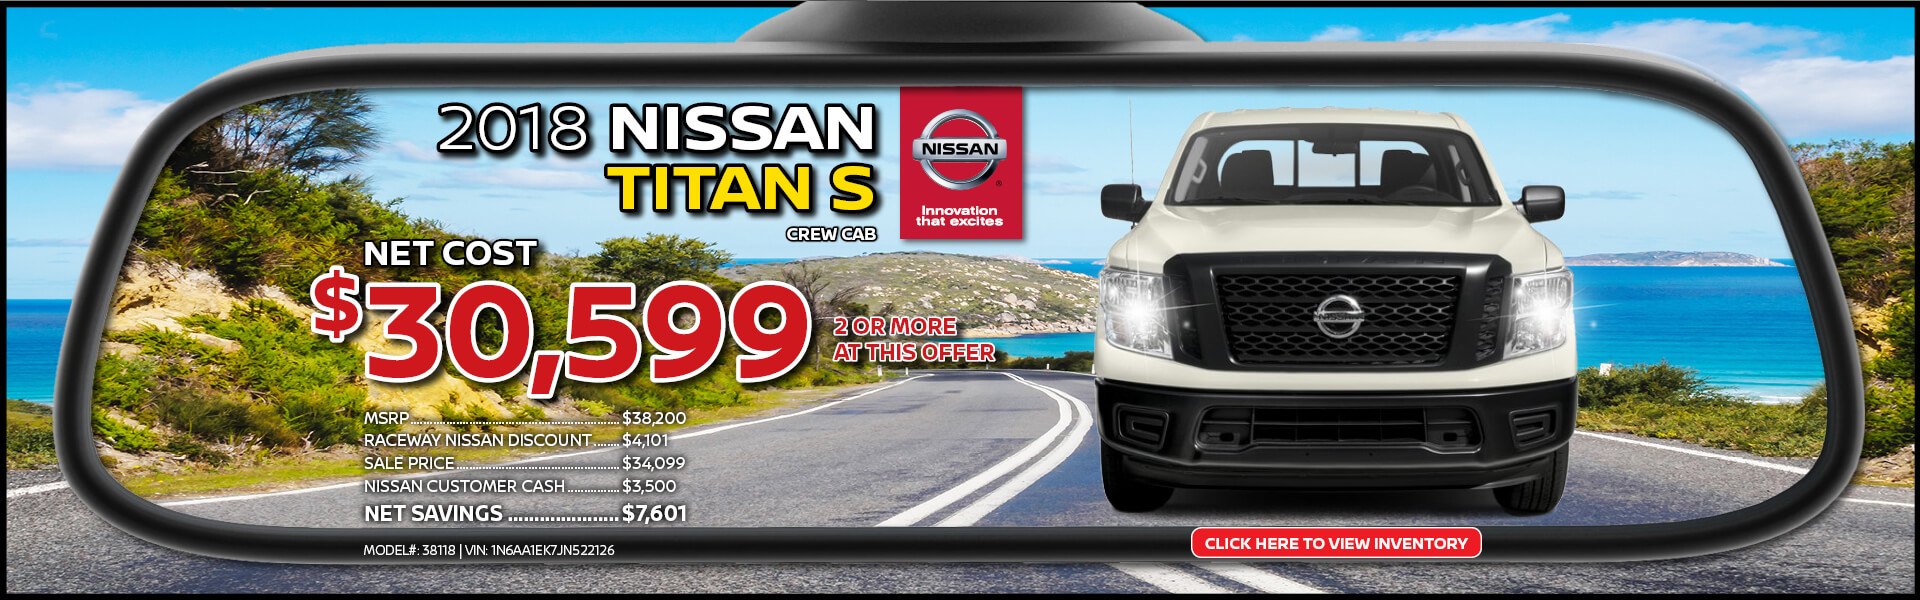 Nissan Titan $30,599 Purchase